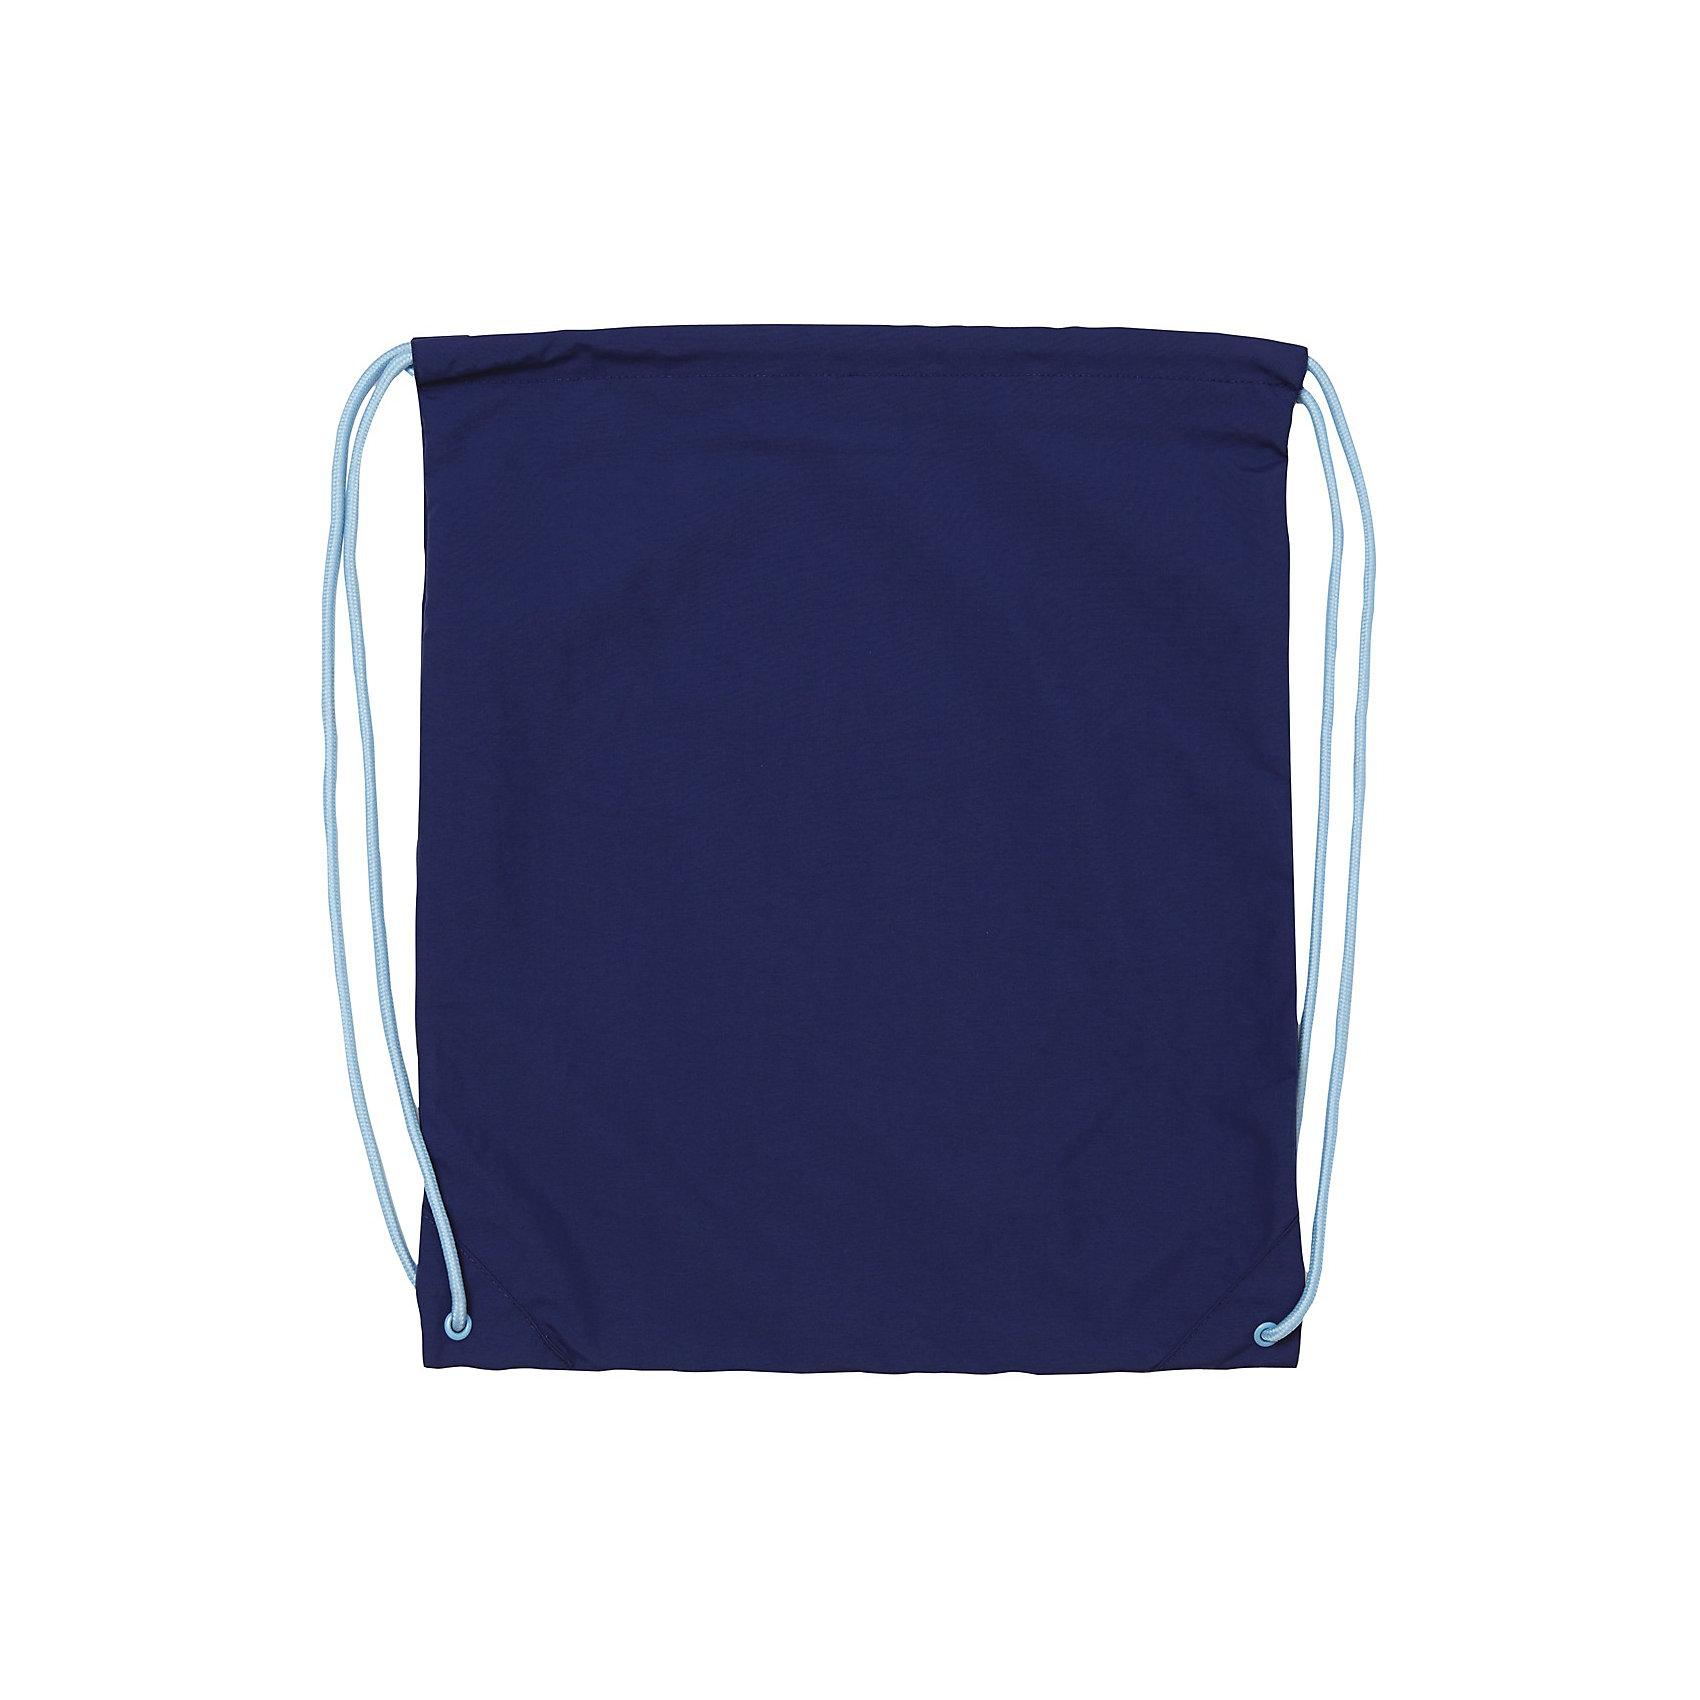 Сумка для мальчика PlayToday* сумка-мешок из водоотталкивающей ткани<br>* затягивается на шнурок<br>* нашивка-адресник<br>Состав:<br>100% нейлон<br><br>Ширина мм: 170<br>Глубина мм: 157<br>Высота мм: 67<br>Вес г: 117<br>Цвет: синий<br>Возраст от месяцев: 36<br>Возраст до месяцев: 96<br>Пол: Мужской<br>Возраст: Детский<br>Размер: one size<br>SKU: 3303398